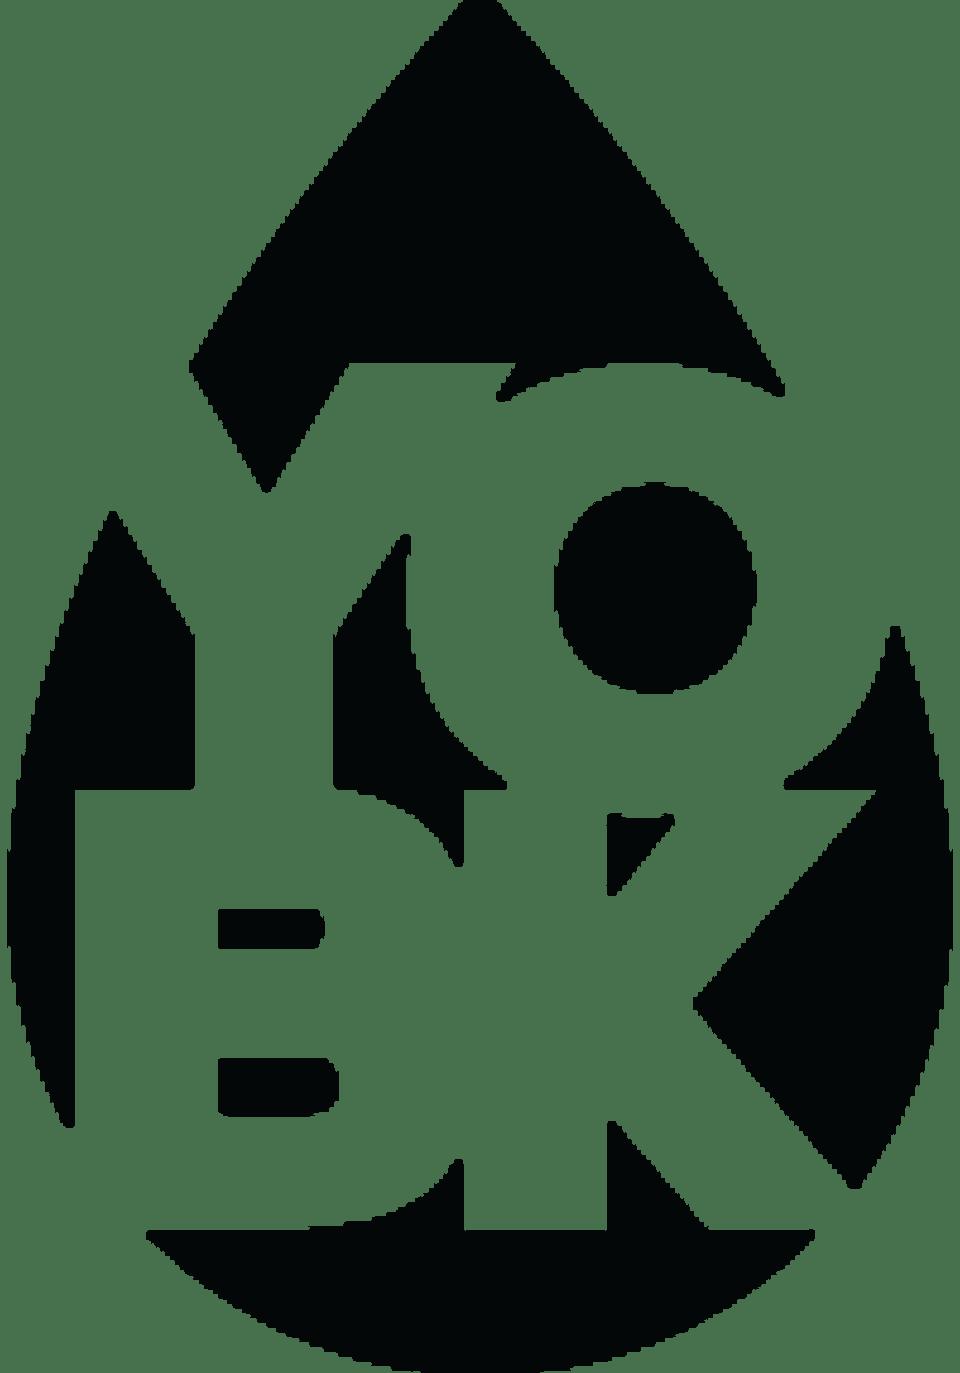 YO BK Williamsburg logo